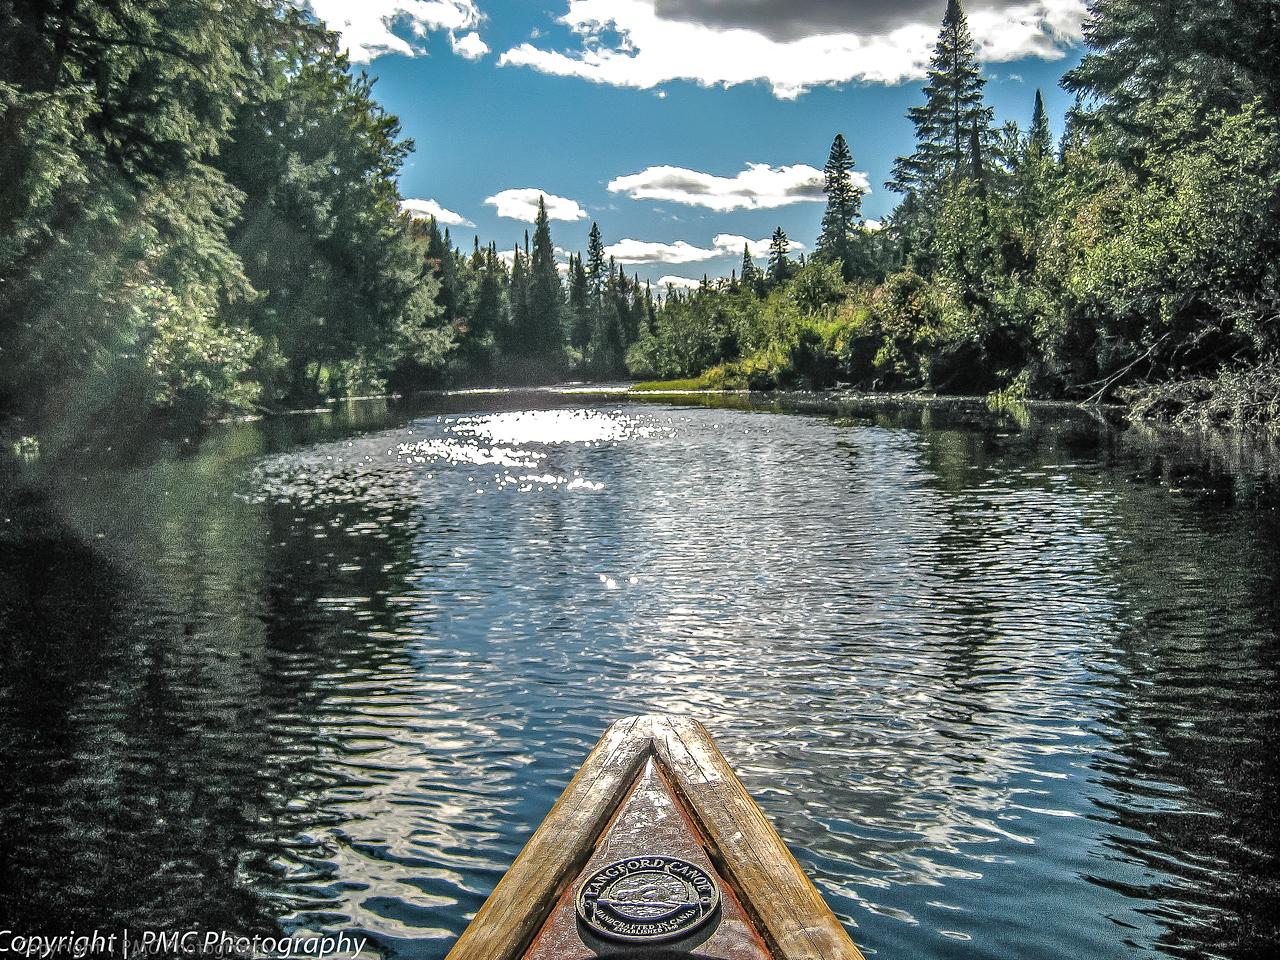 Oxtongue River, Algonquin Provincial Park